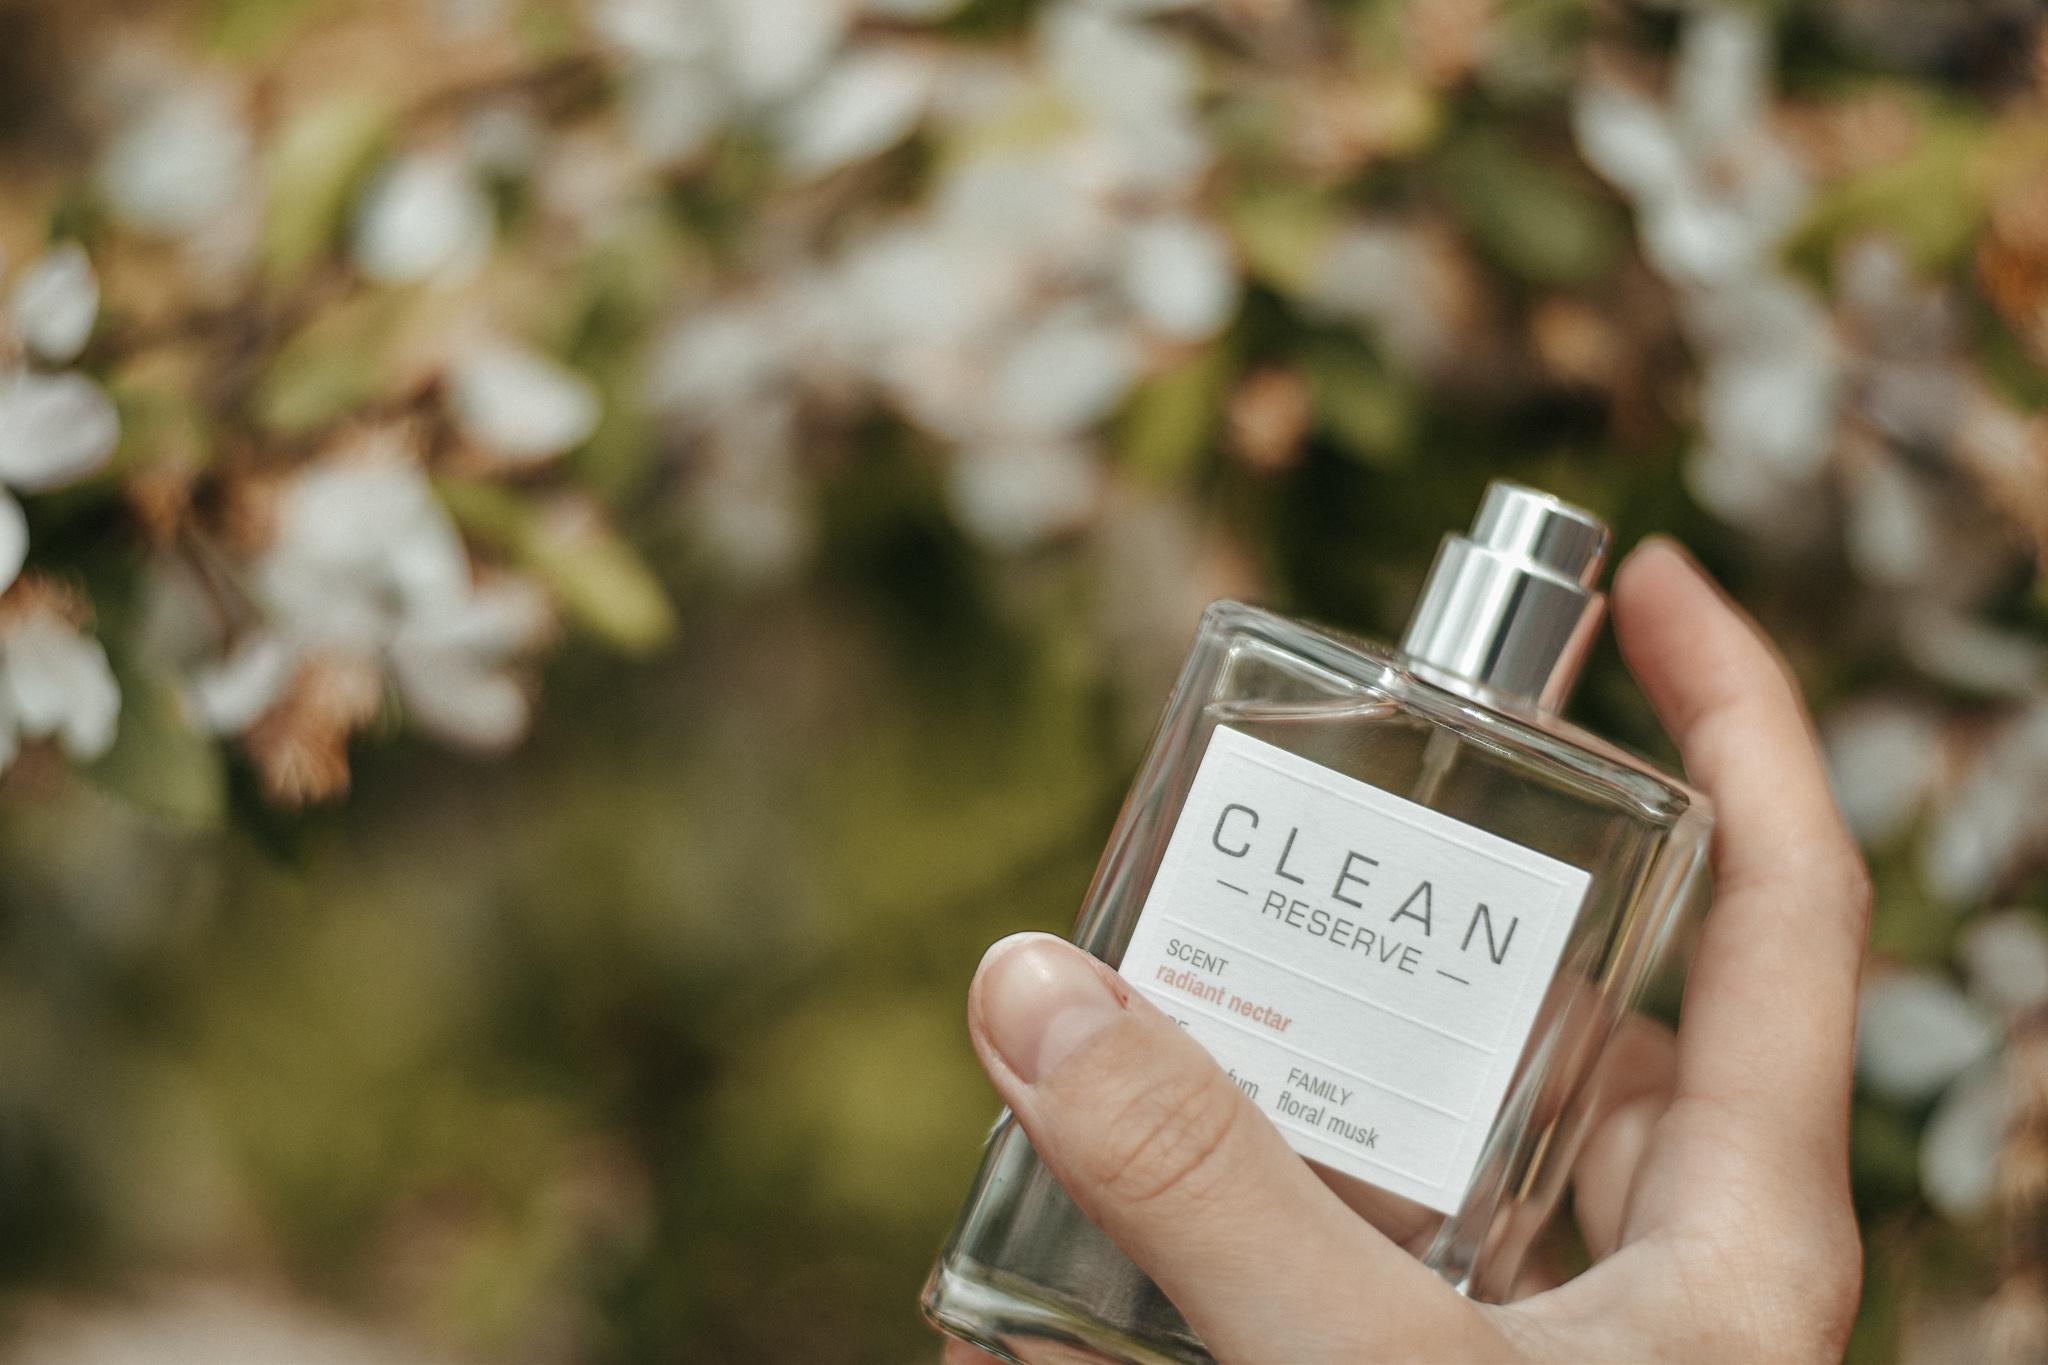 Clean Reserve radiant nectar parfum